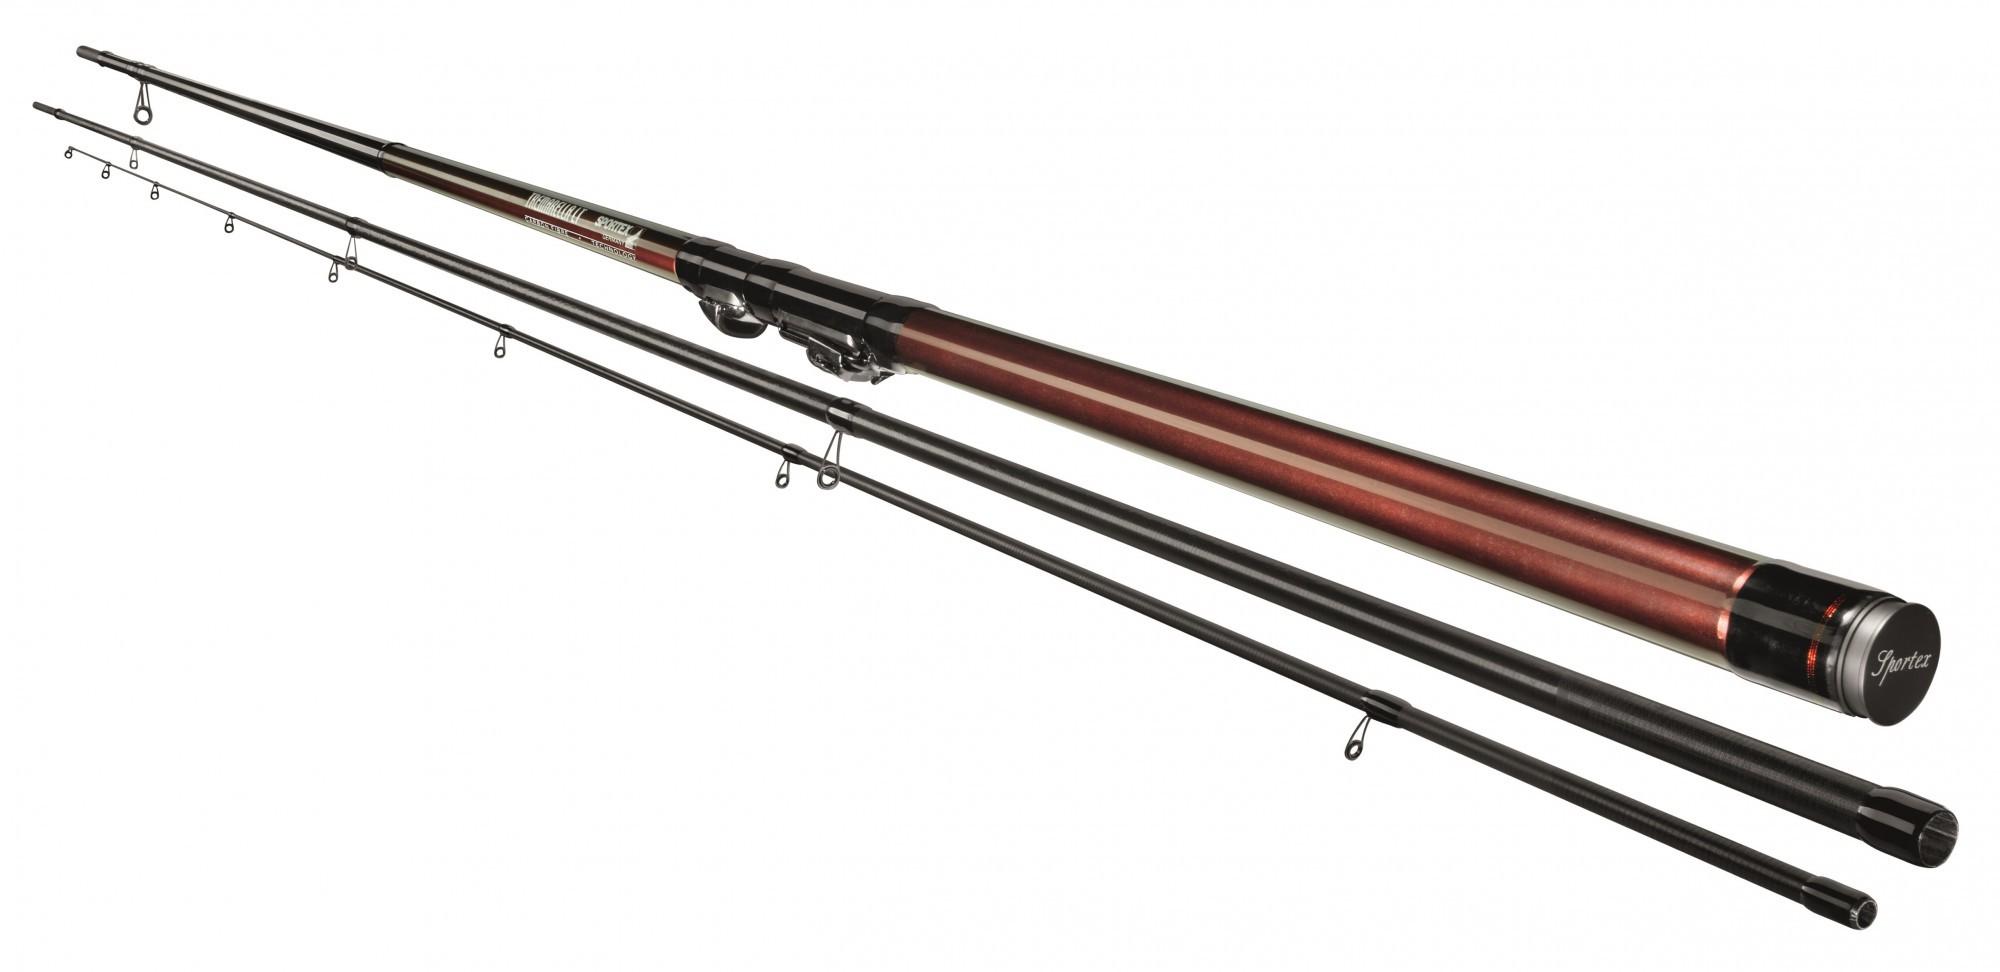 Matchrute Sportex Exclusive Match Medium MR3911 3,90m 8-20g Forellenrute Trout